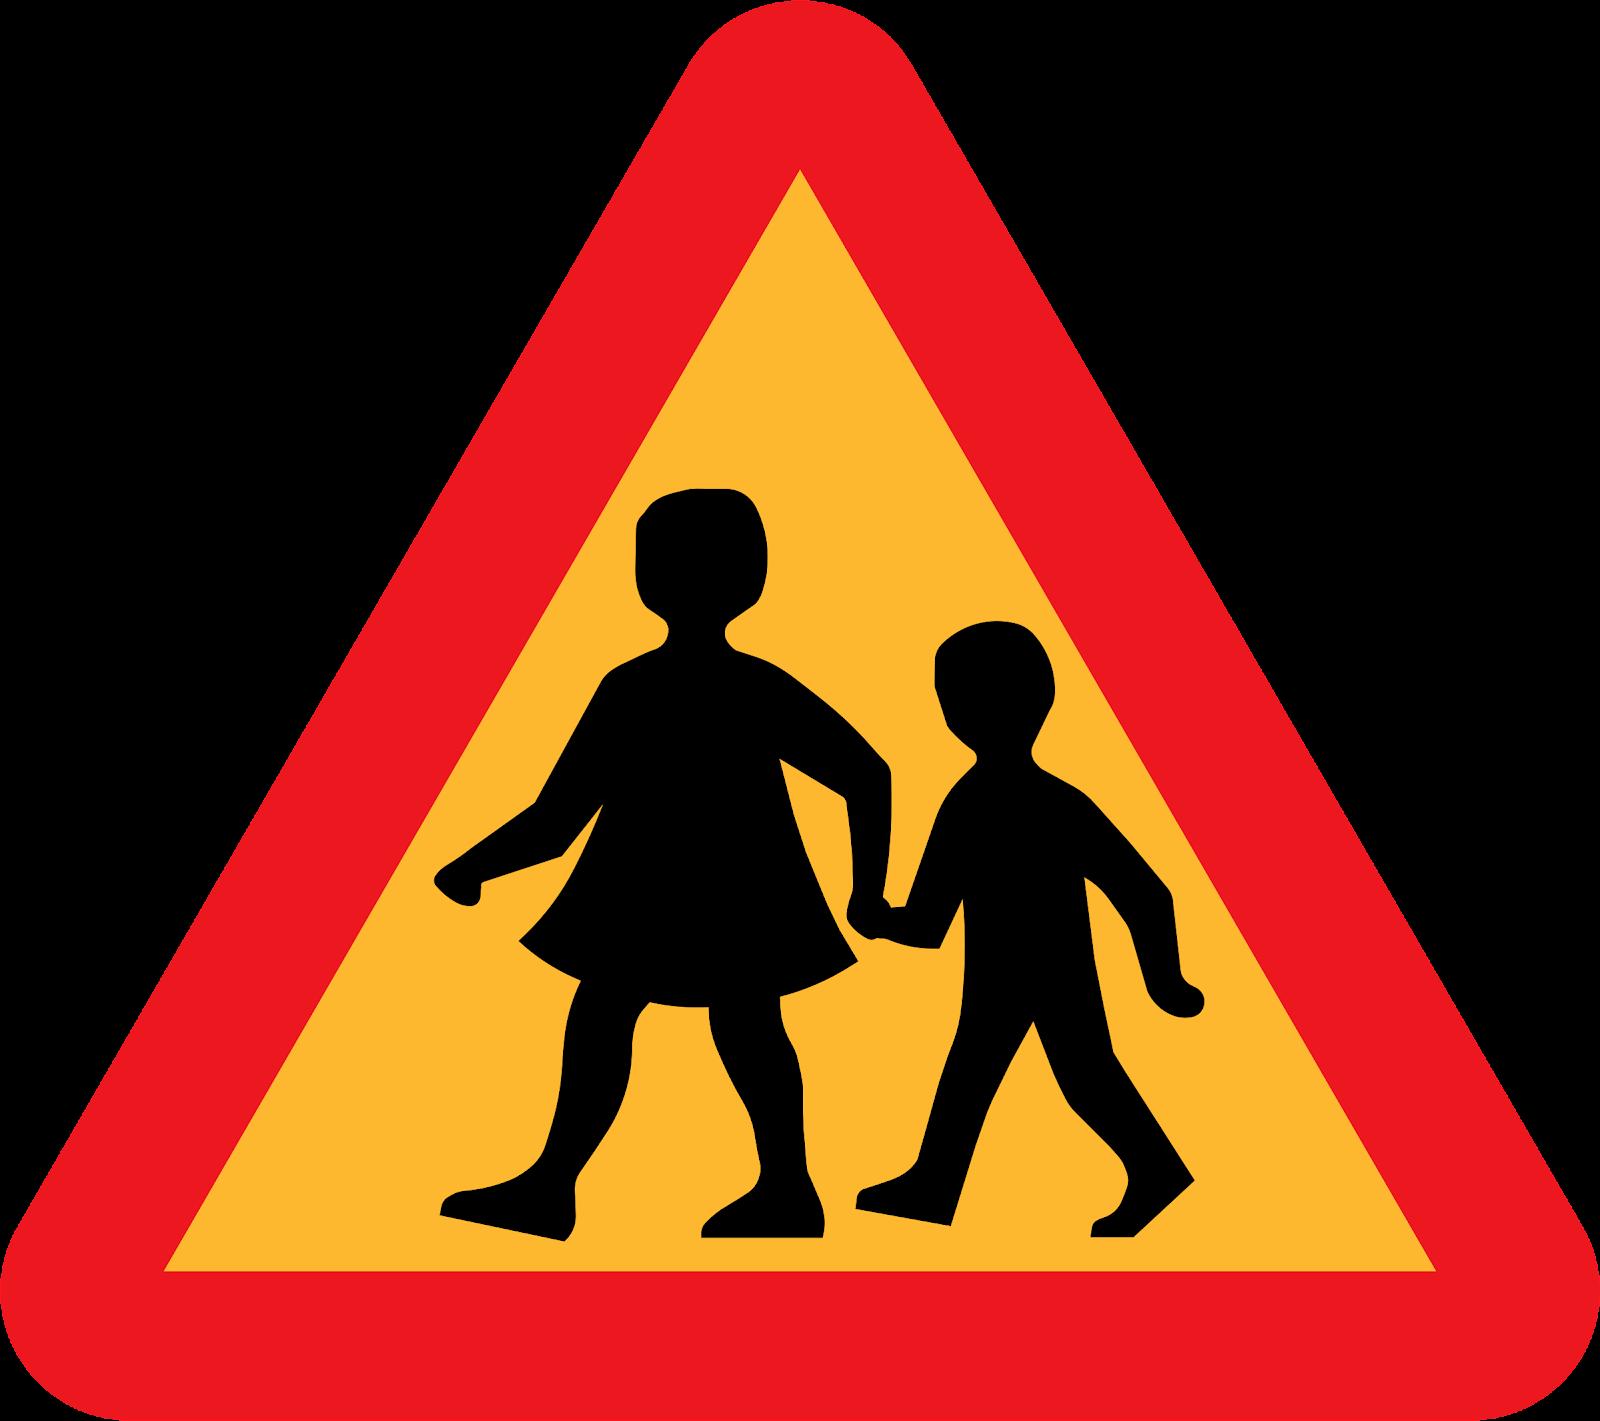 Crossing.png